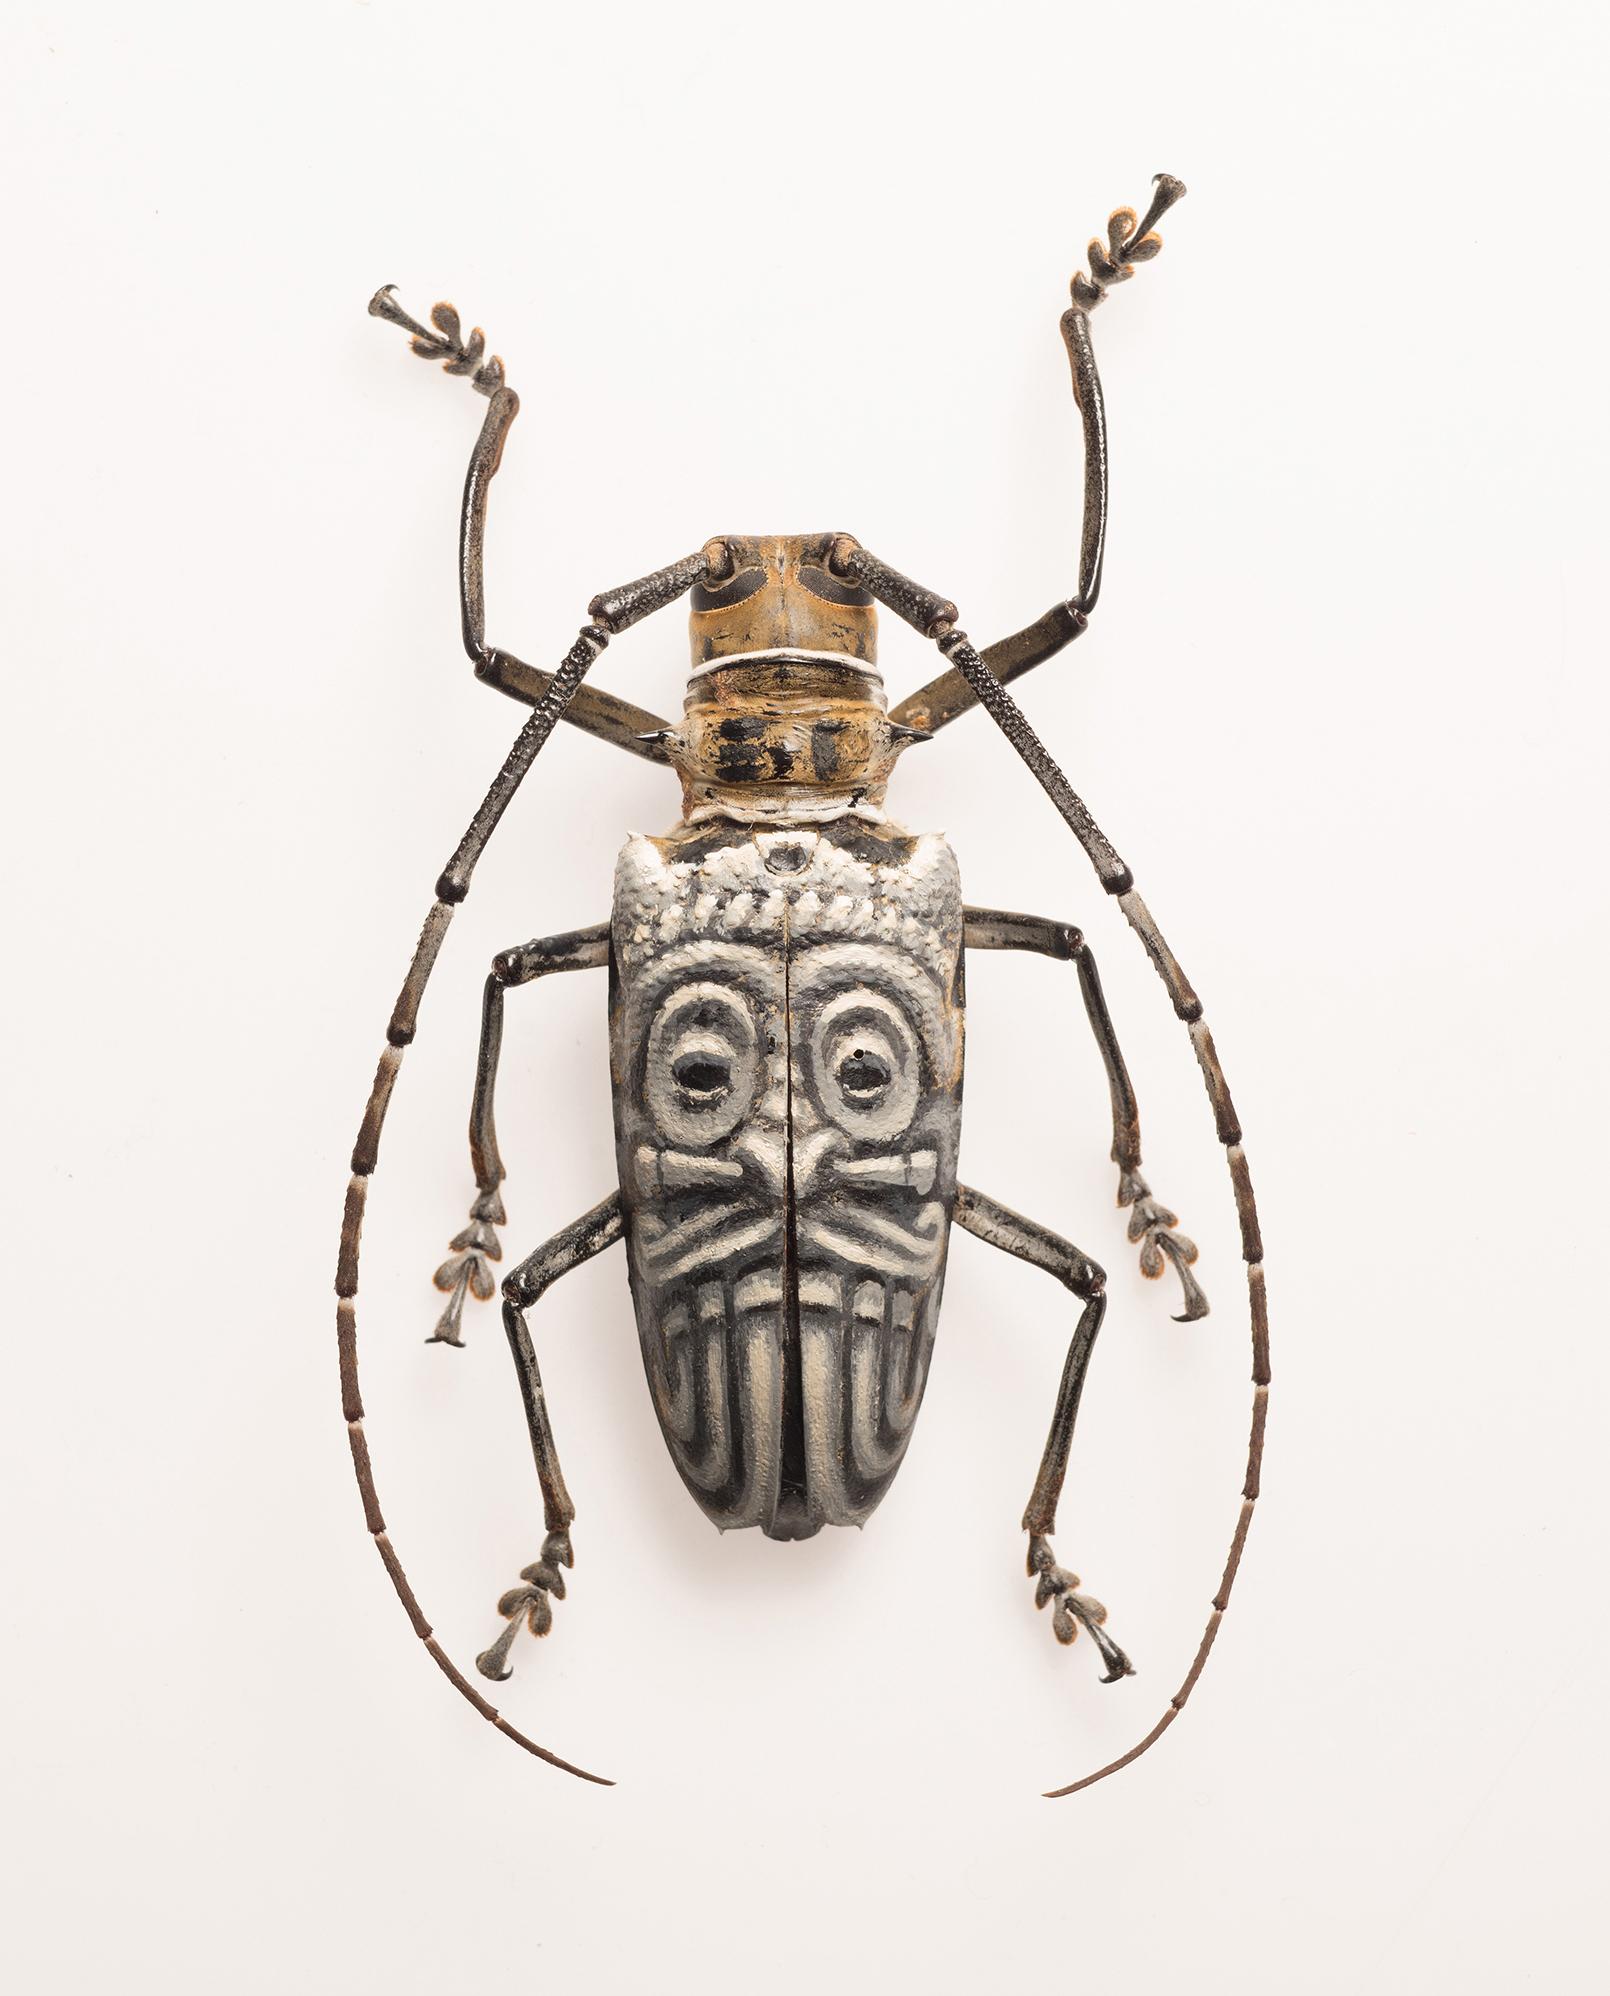 "Evan Skrederstu.  Tlaloc Mask.  2015 - acrylic on bug, 2"" x 3.5""."